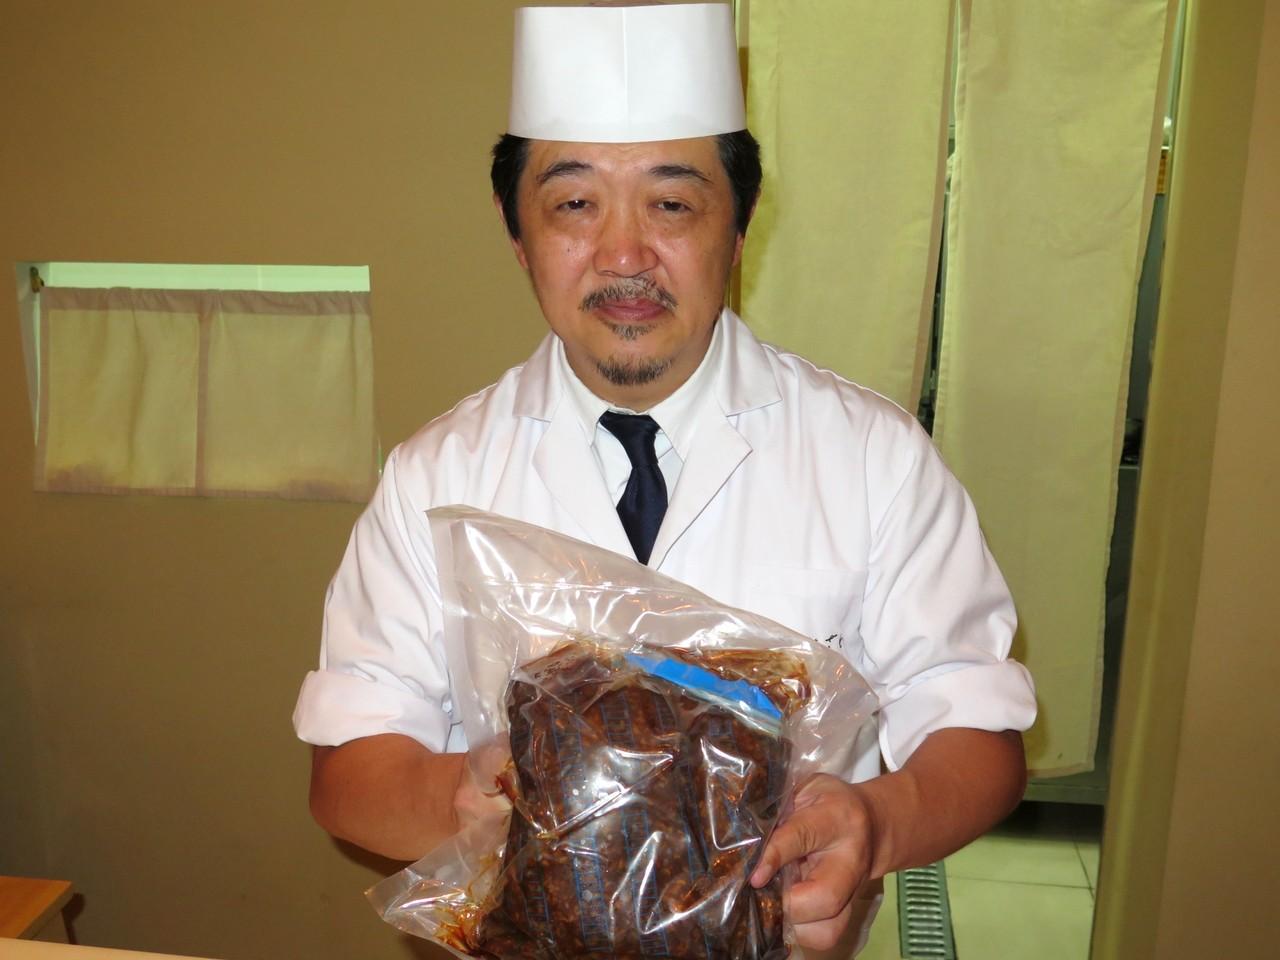 Tomoaki Kanazawa e o arroz fermentado